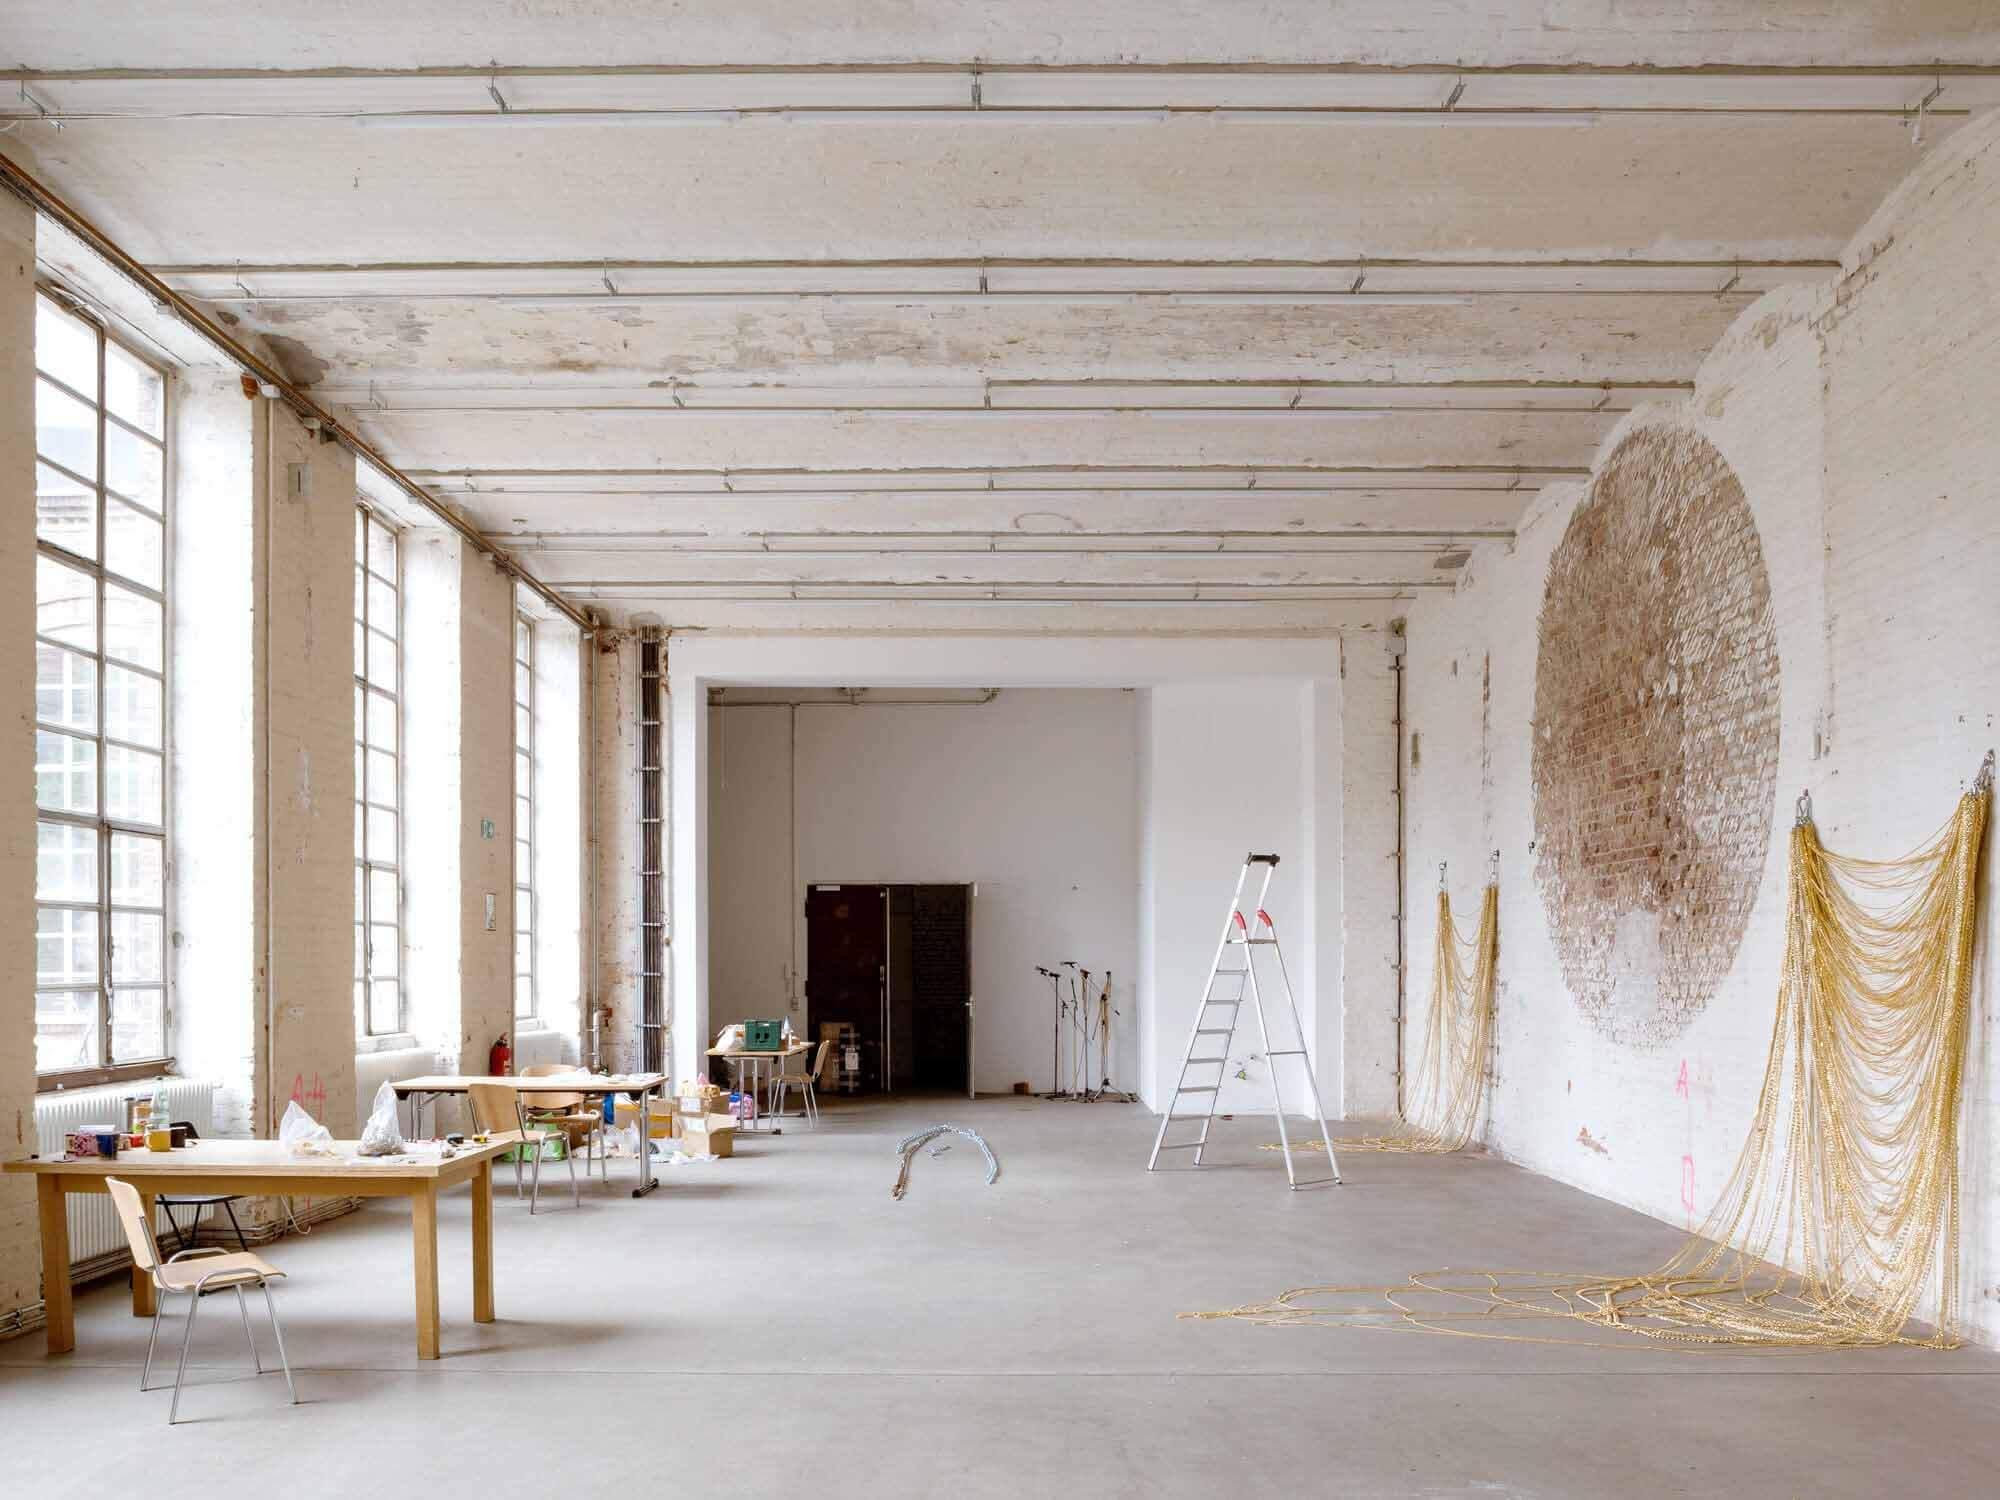 Lindower 22 Building / Asa Studio Albanese